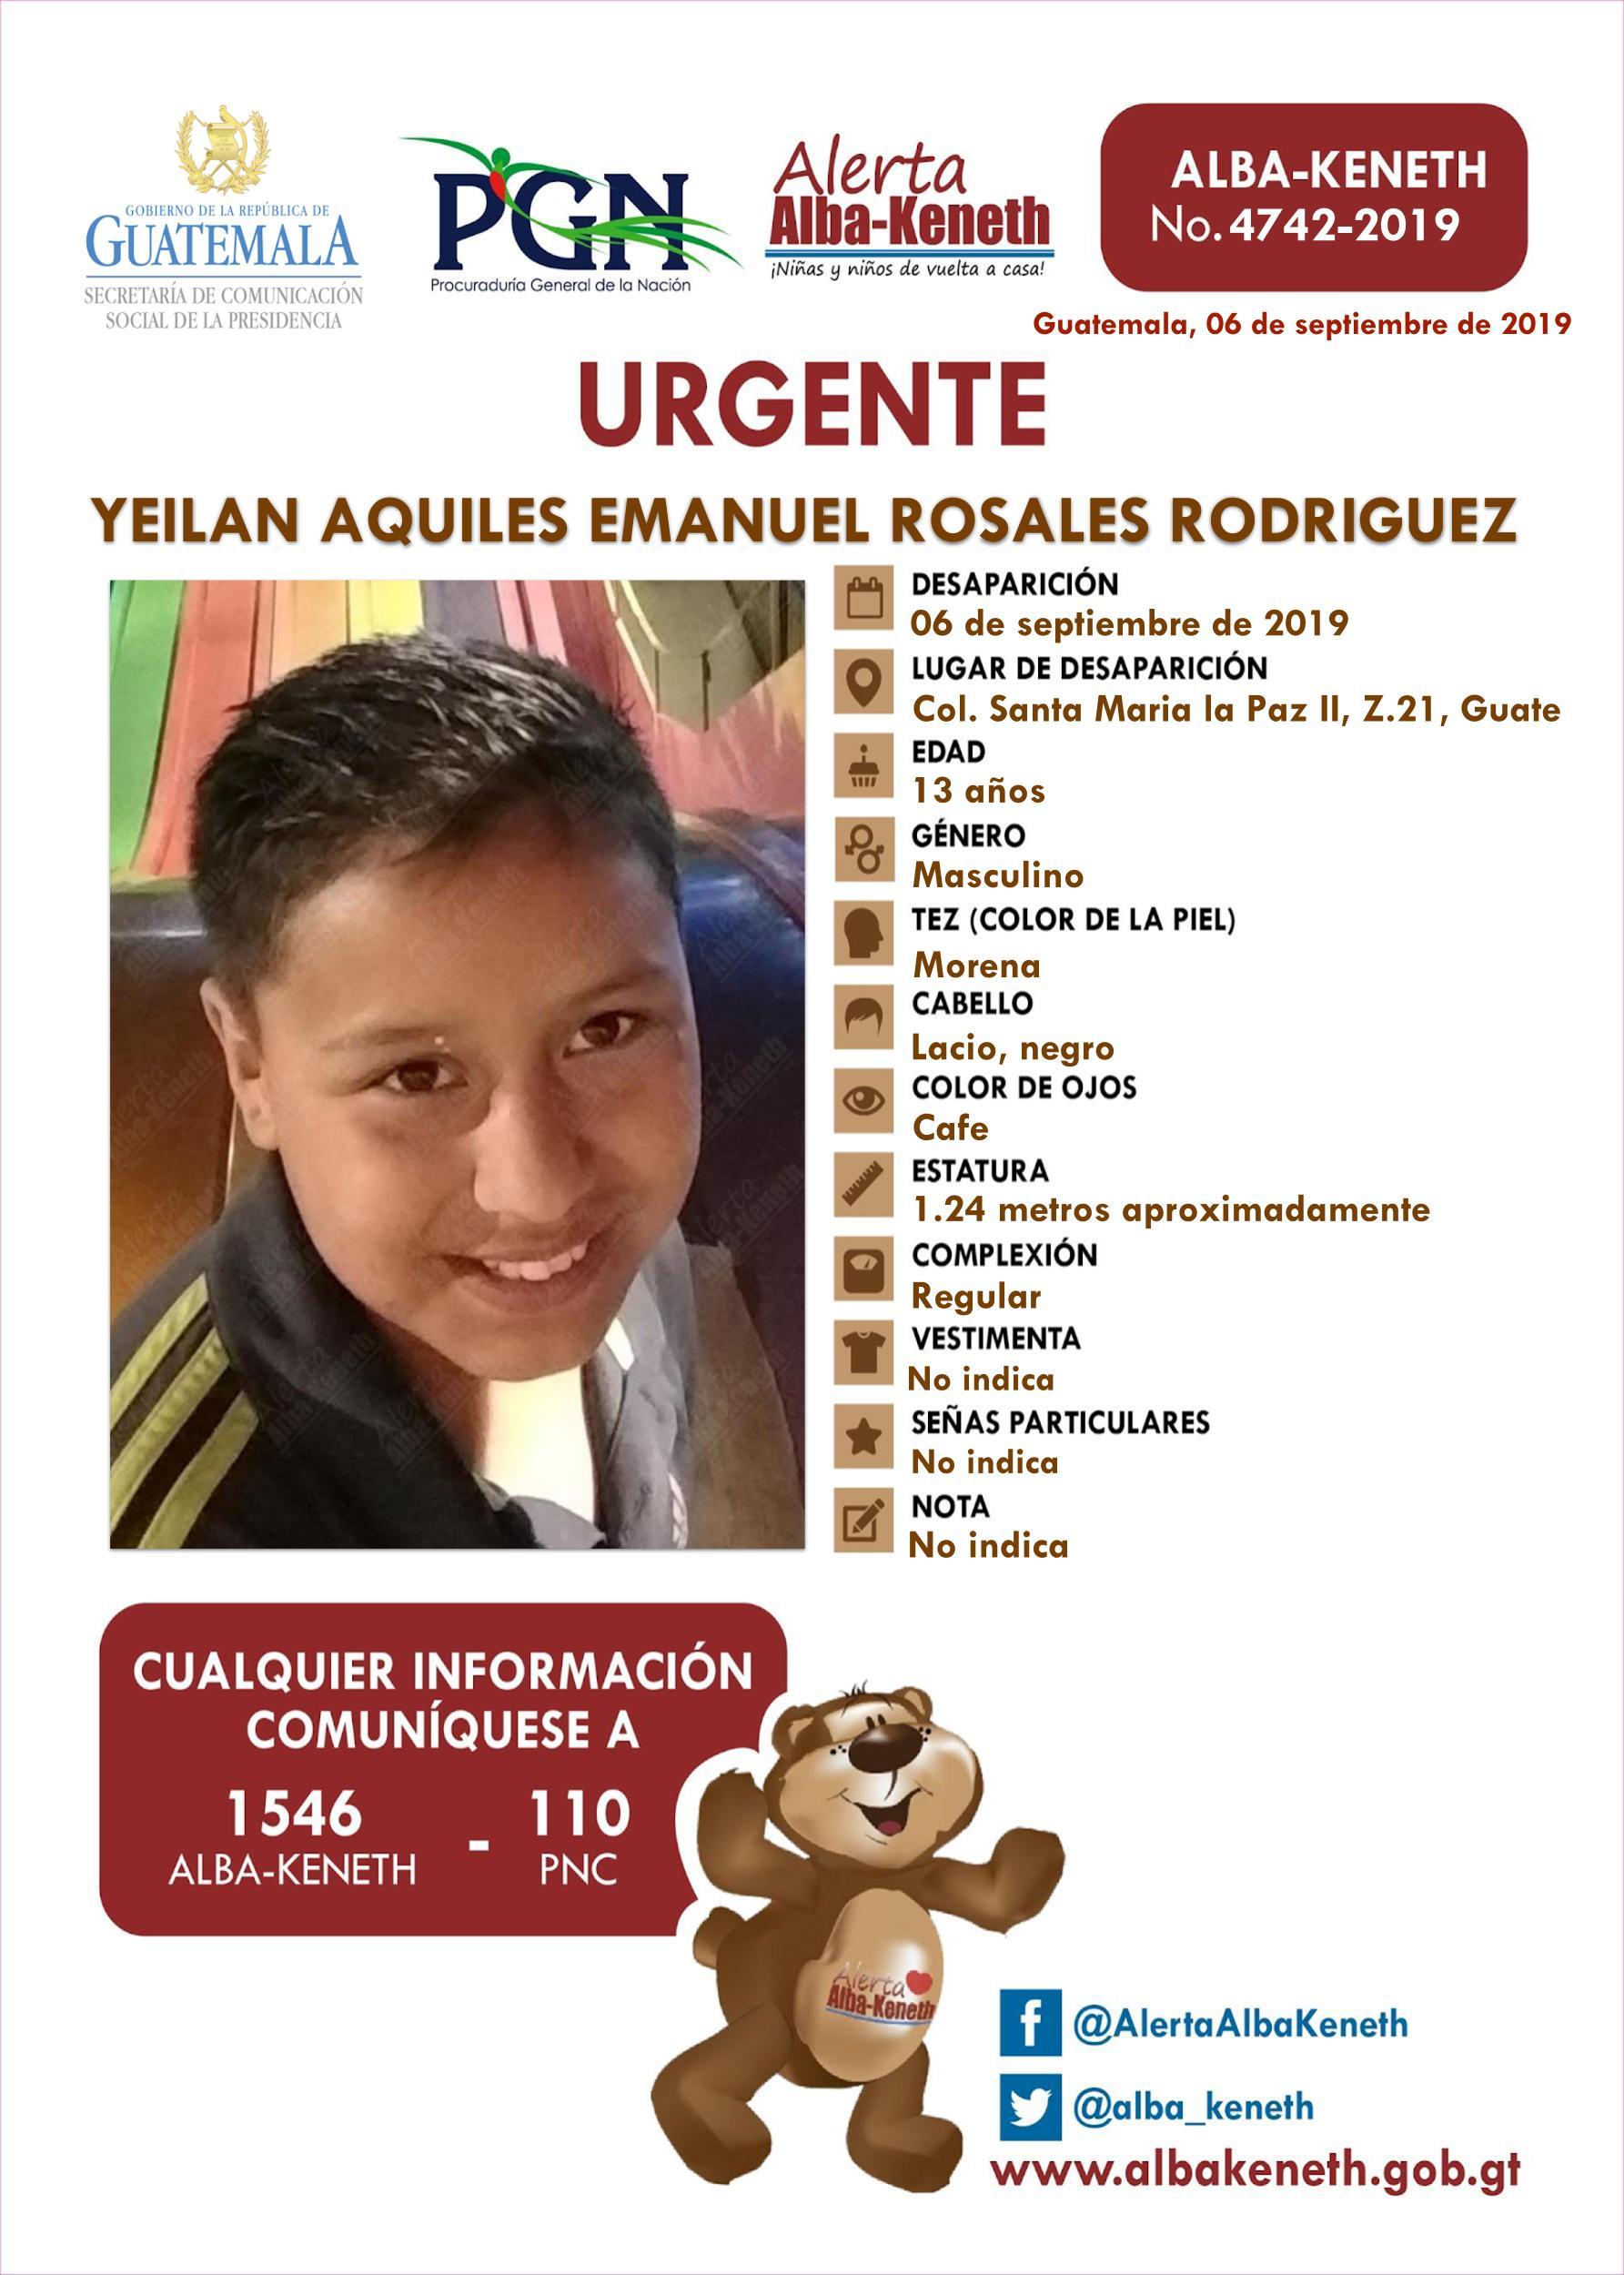 Yeilan Aquiles Emanuel Rosales Rodriguez